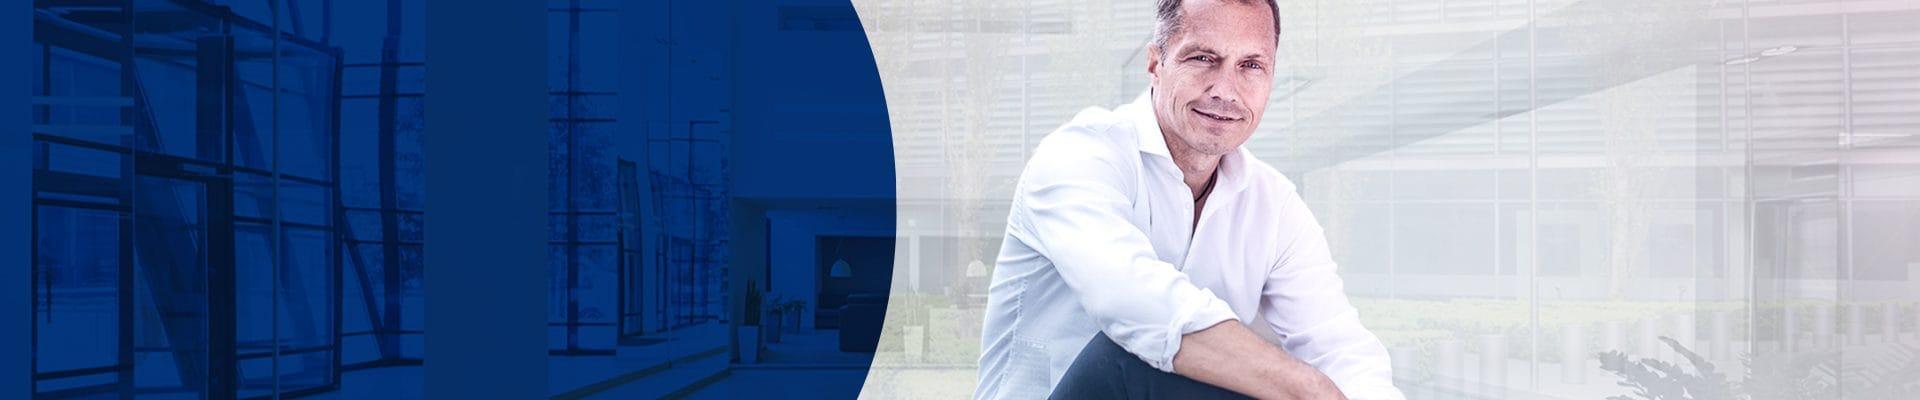 banner web mBlue-ExecutiveSearch final